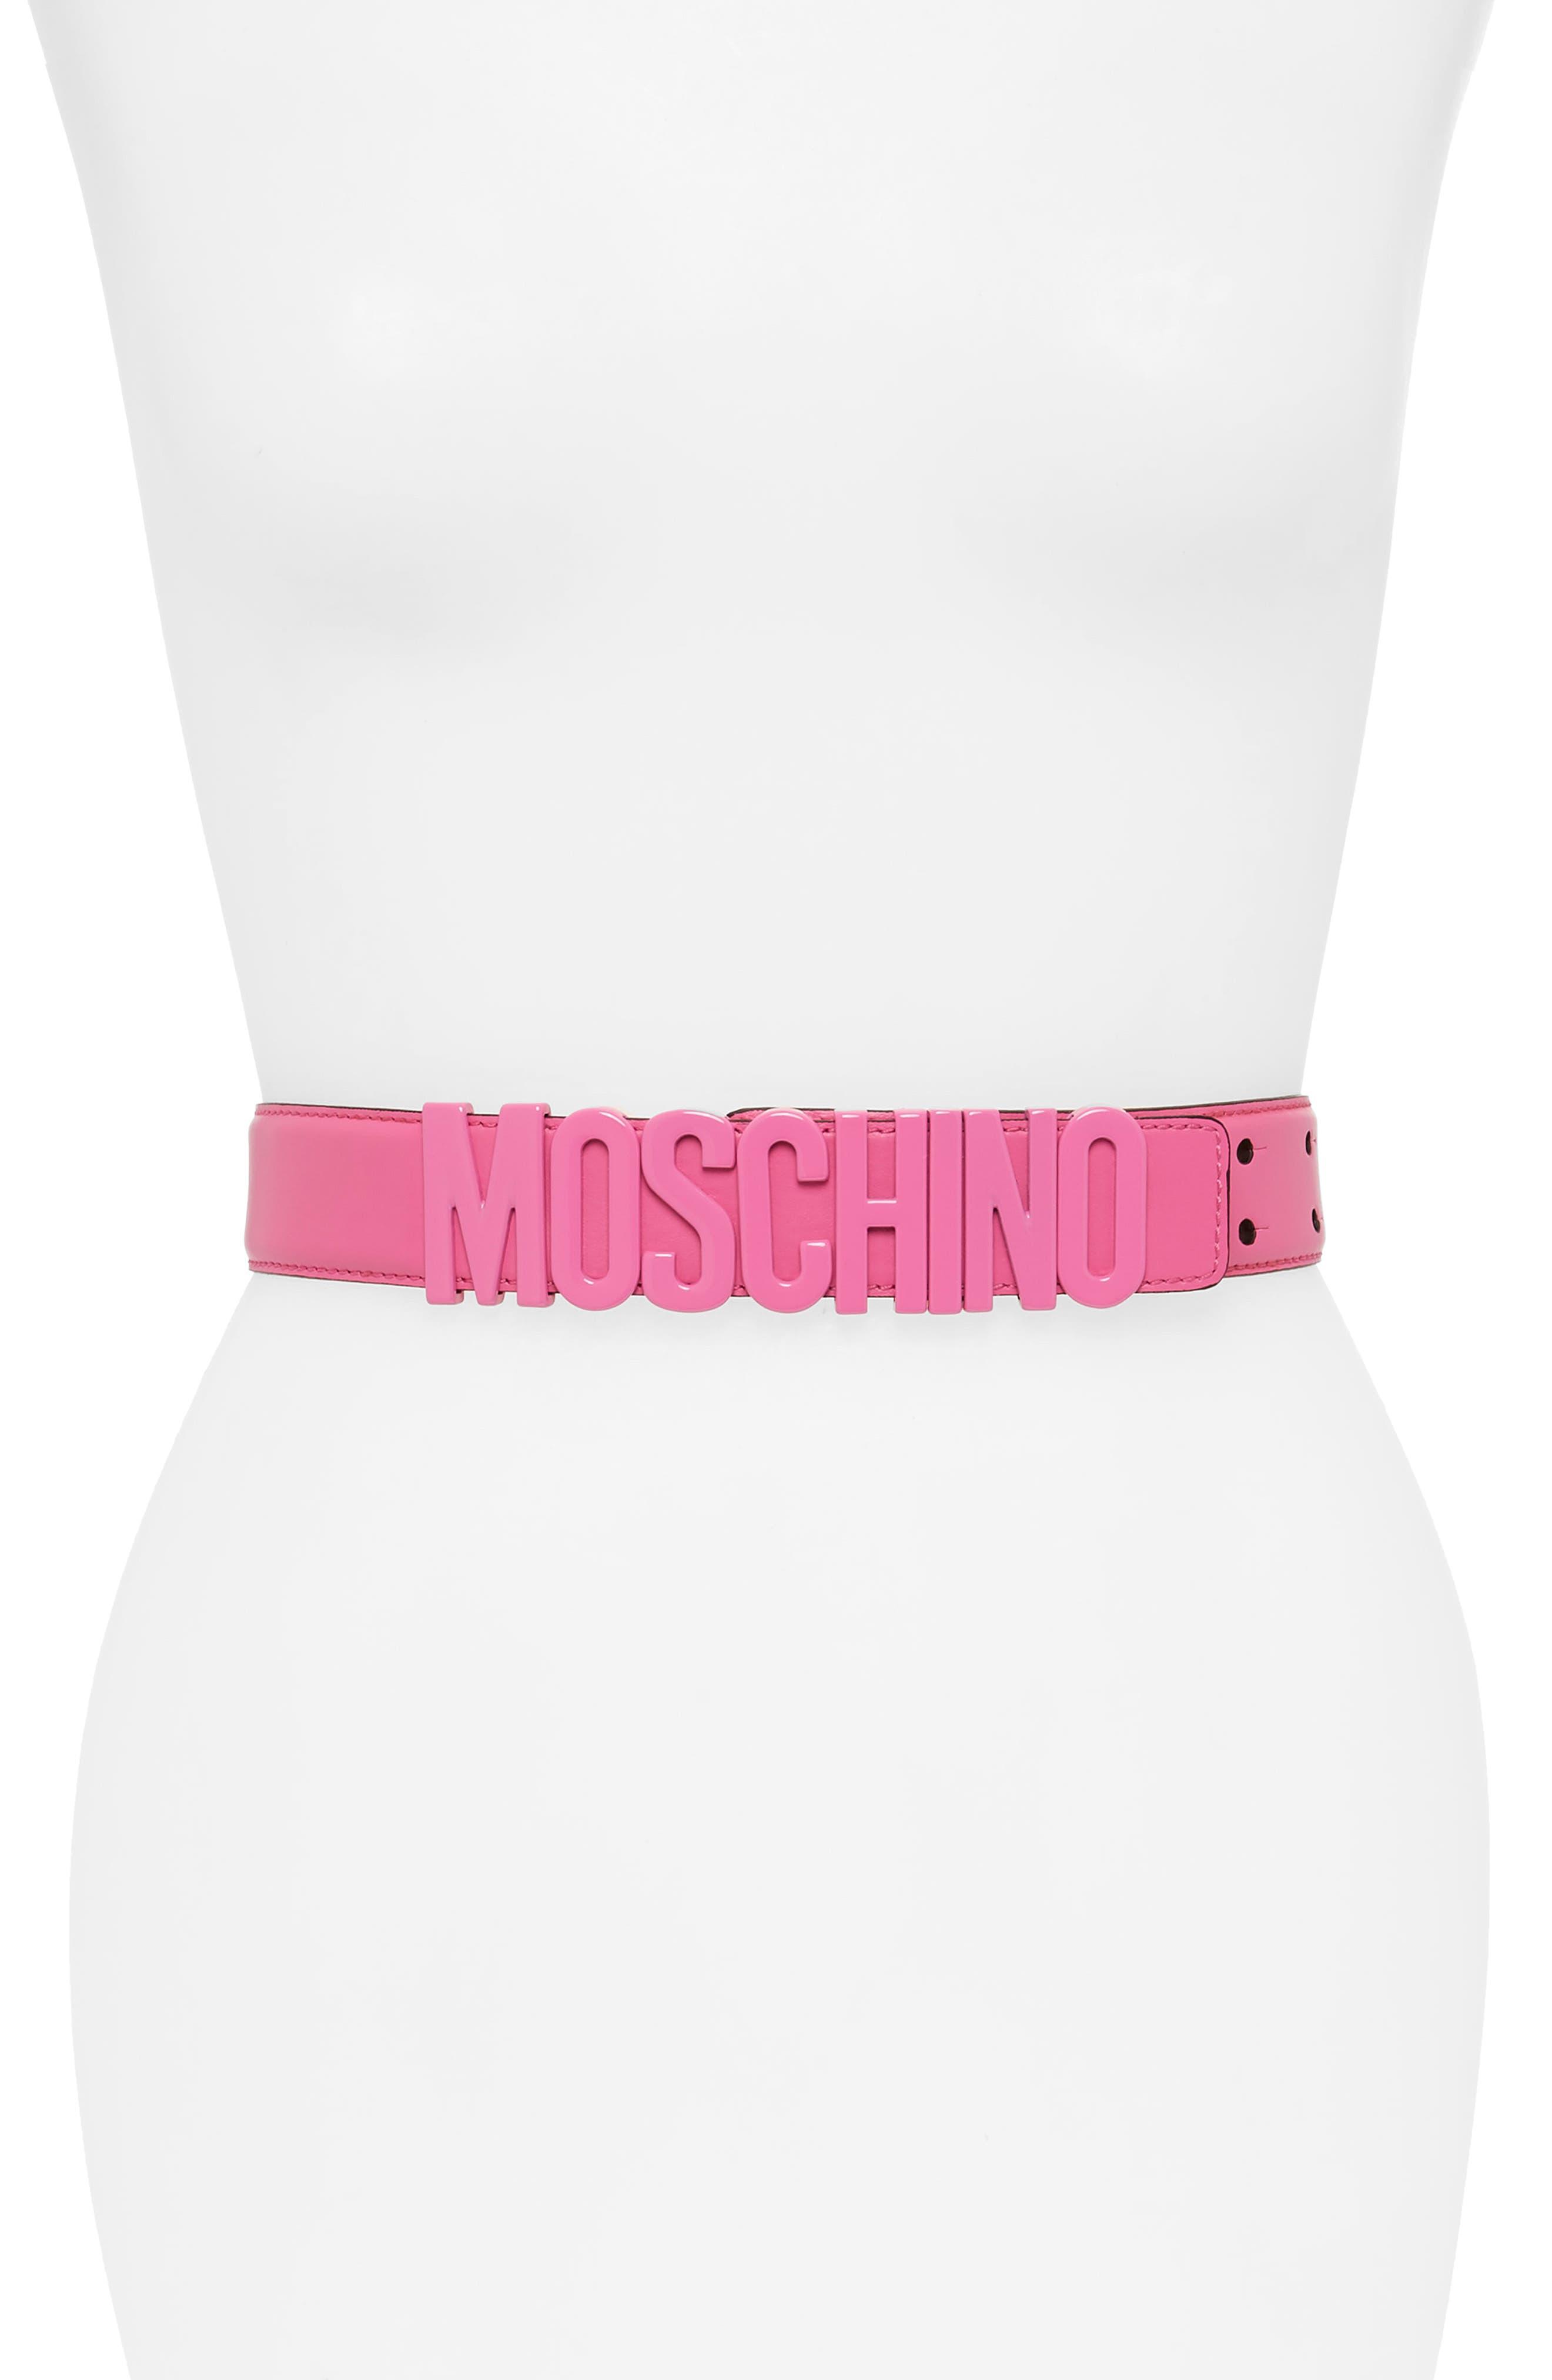 MOSCHINO, Tonal Logo Belt, Main thumbnail 1, color, FUSCIA